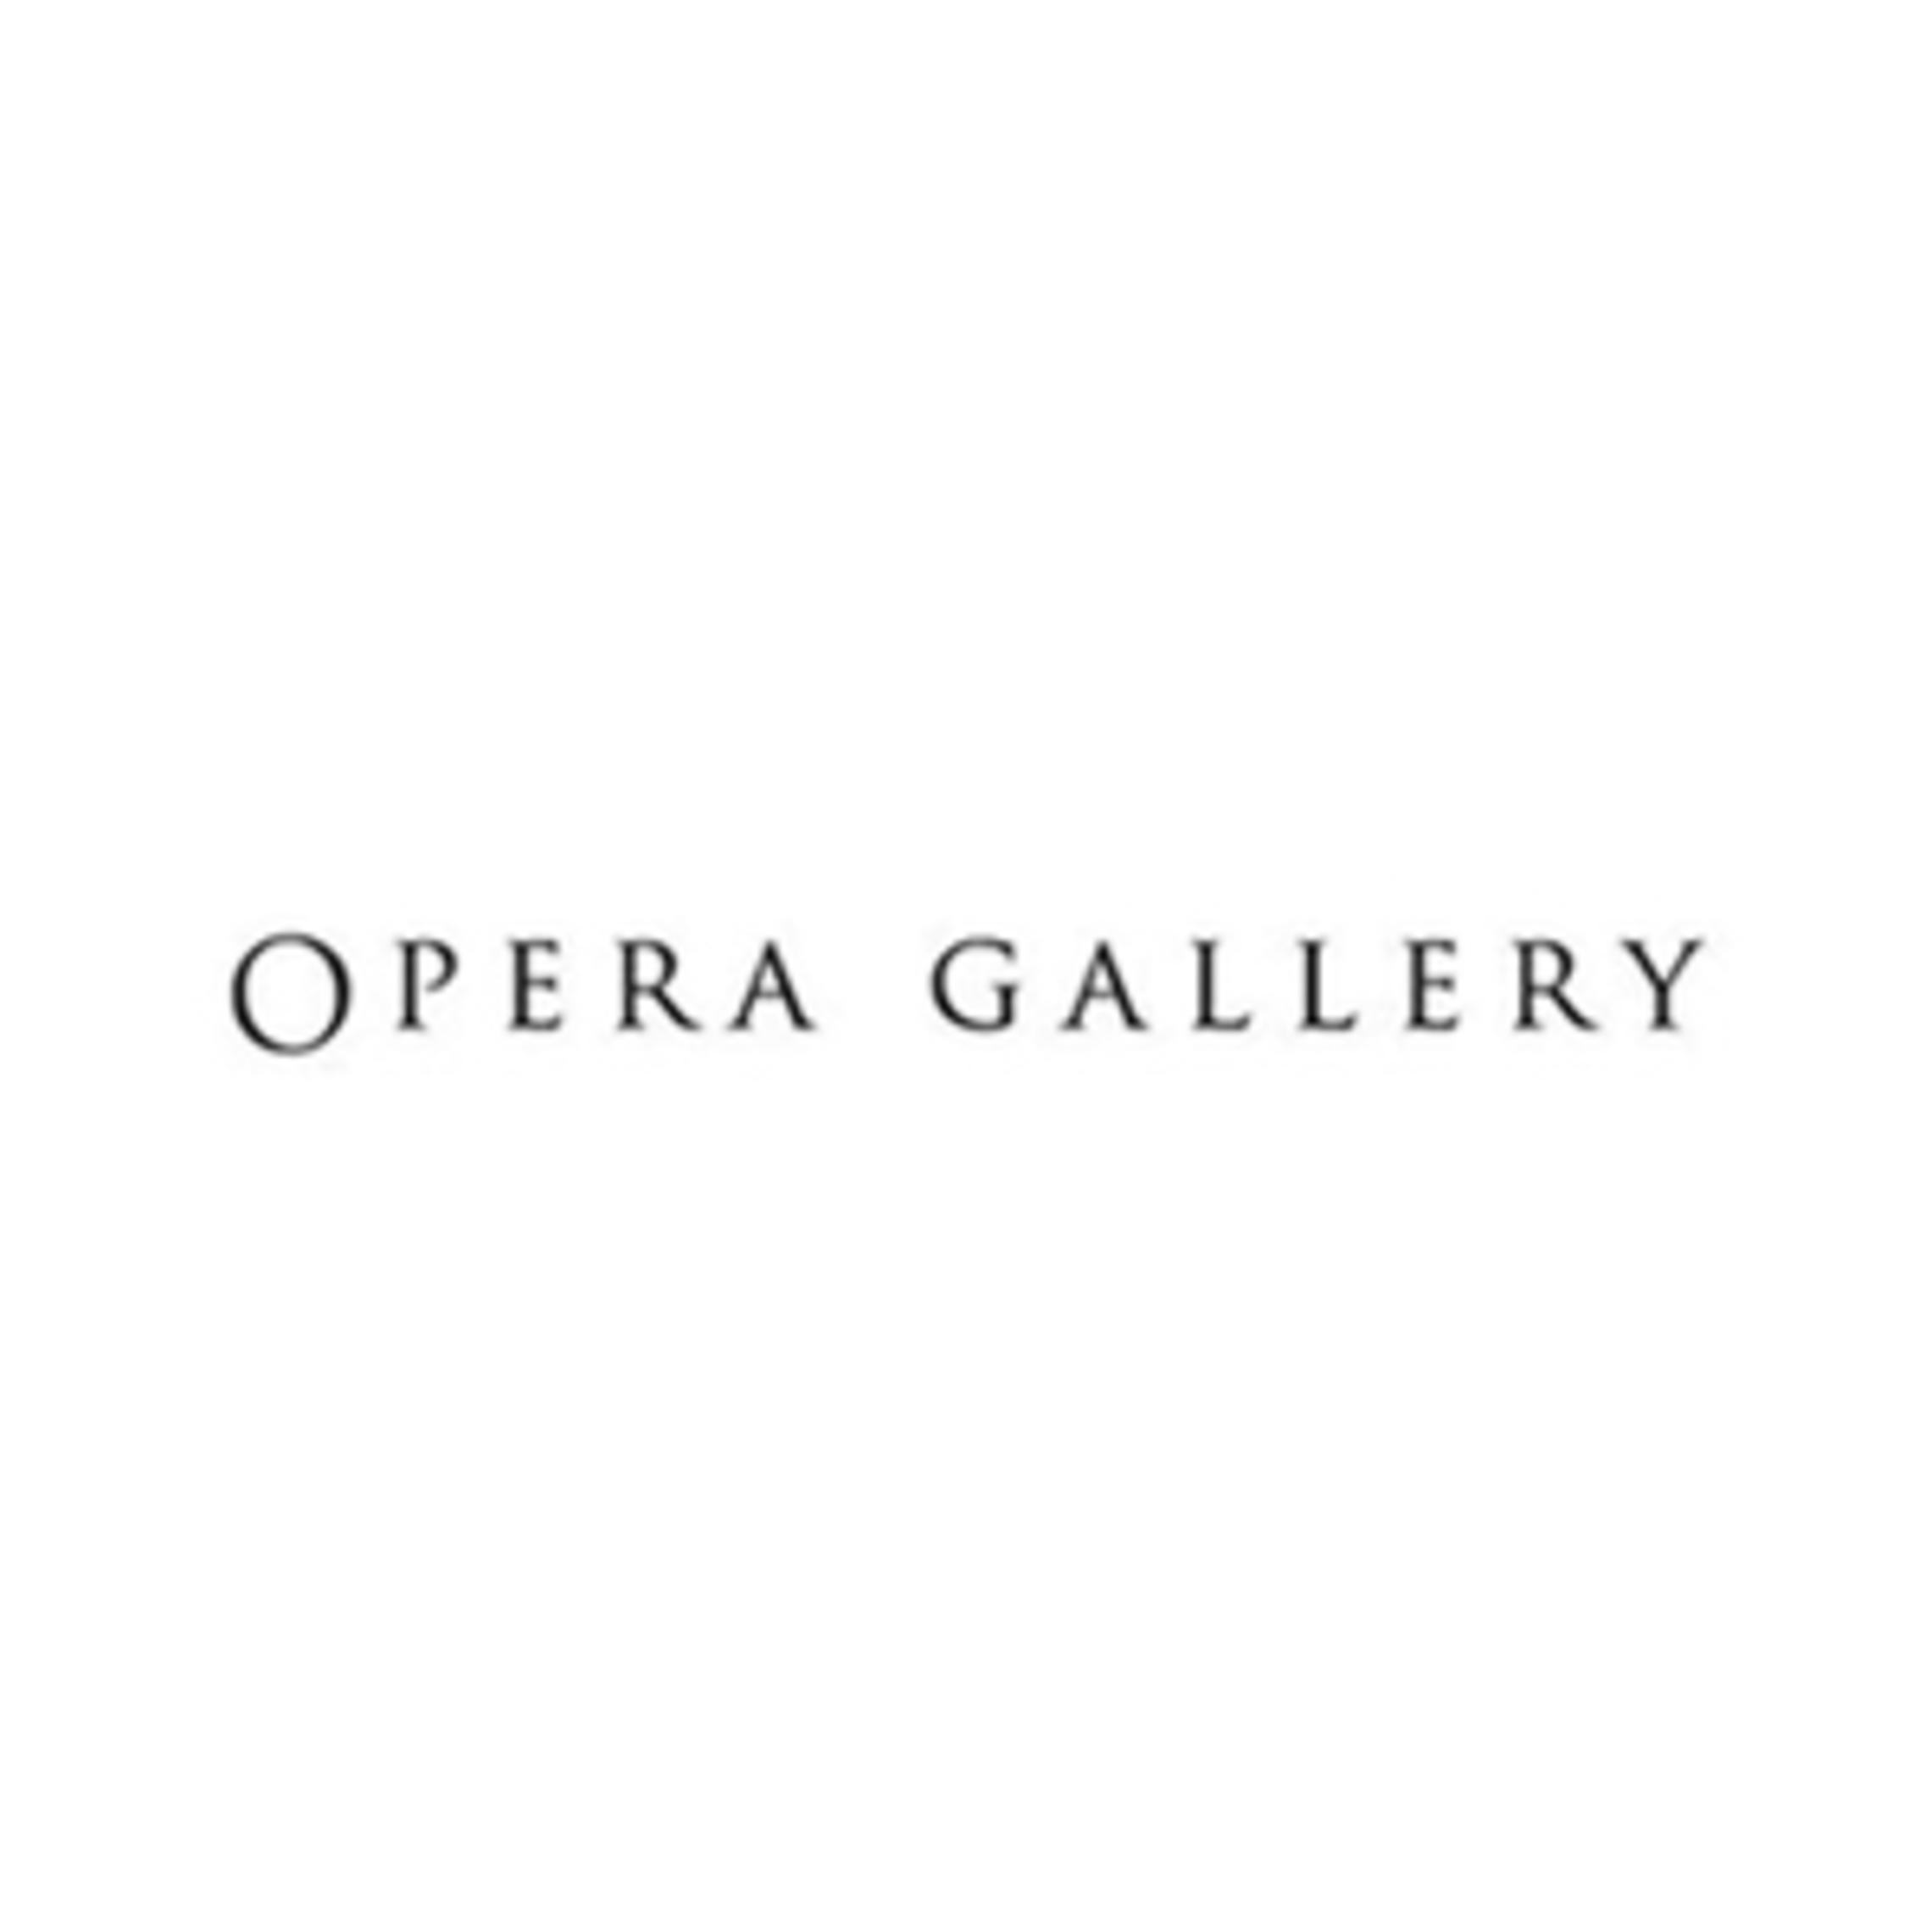 opera gallery singapore- company logo